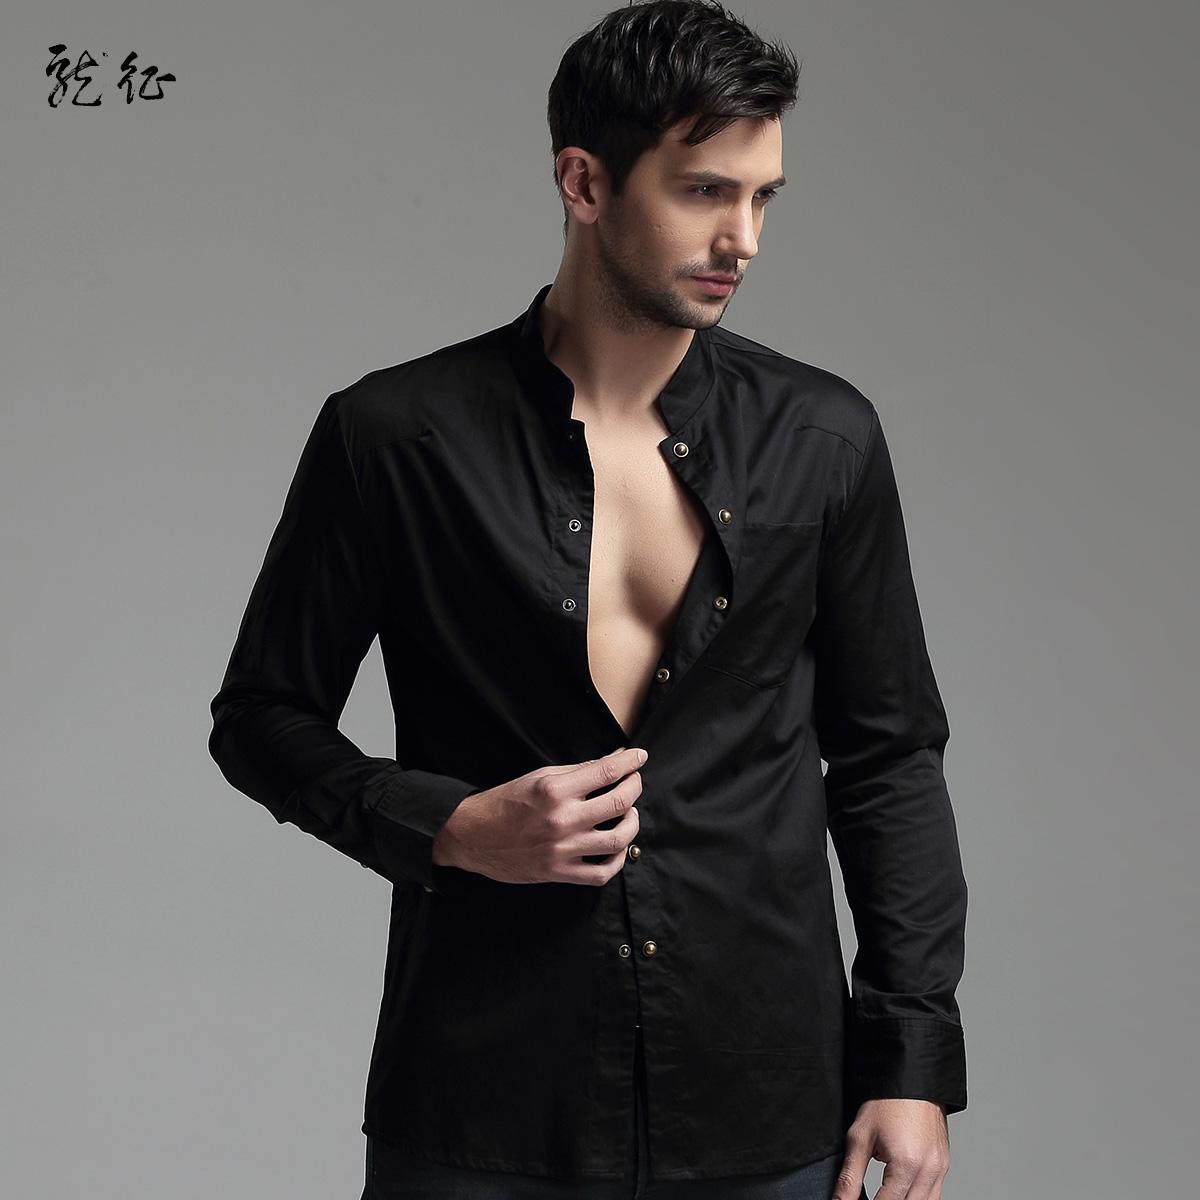 5dad00d06271c Modern Mandarin Collar Snap Button Shirt - Black - Chinese .